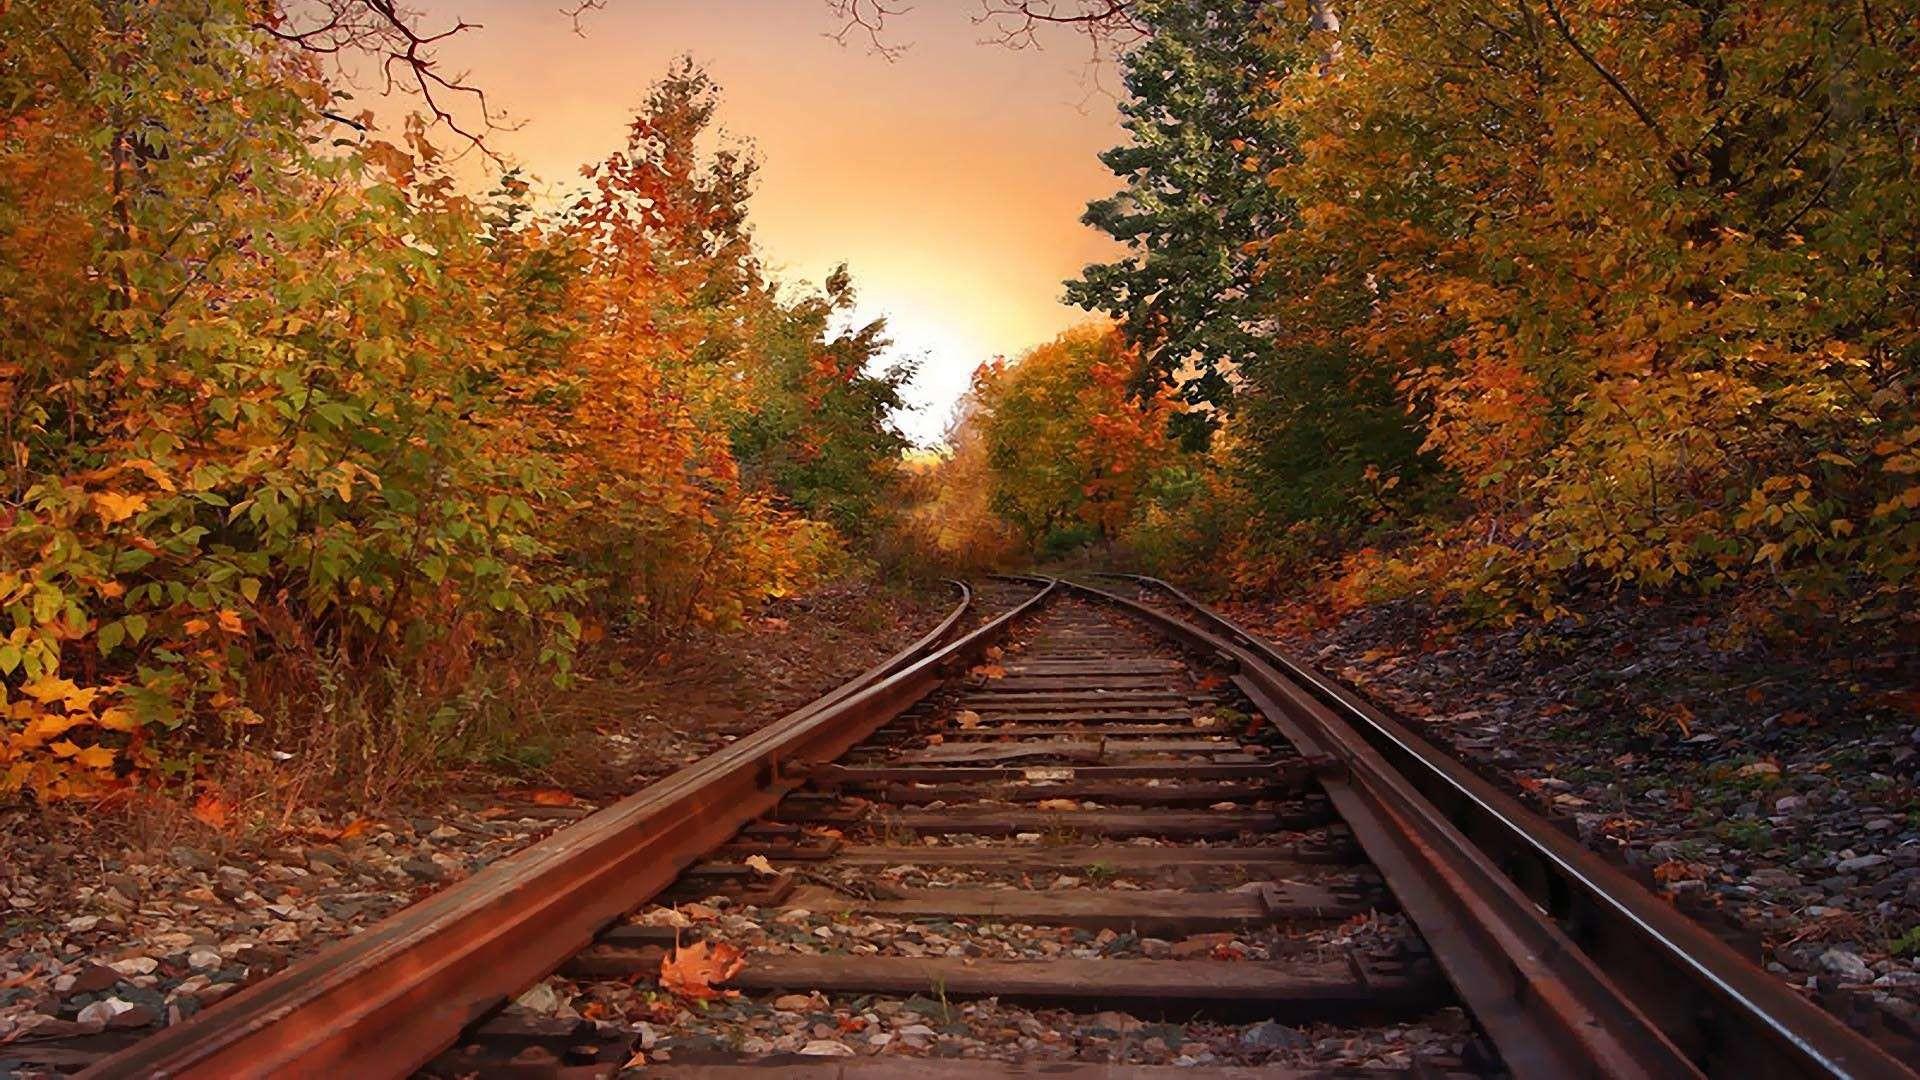 Evening Autumn Rail Hd Wallpaper Hq Backgrounds Wallpapers Autumn Wallpaper  Hd. Original Resolution px